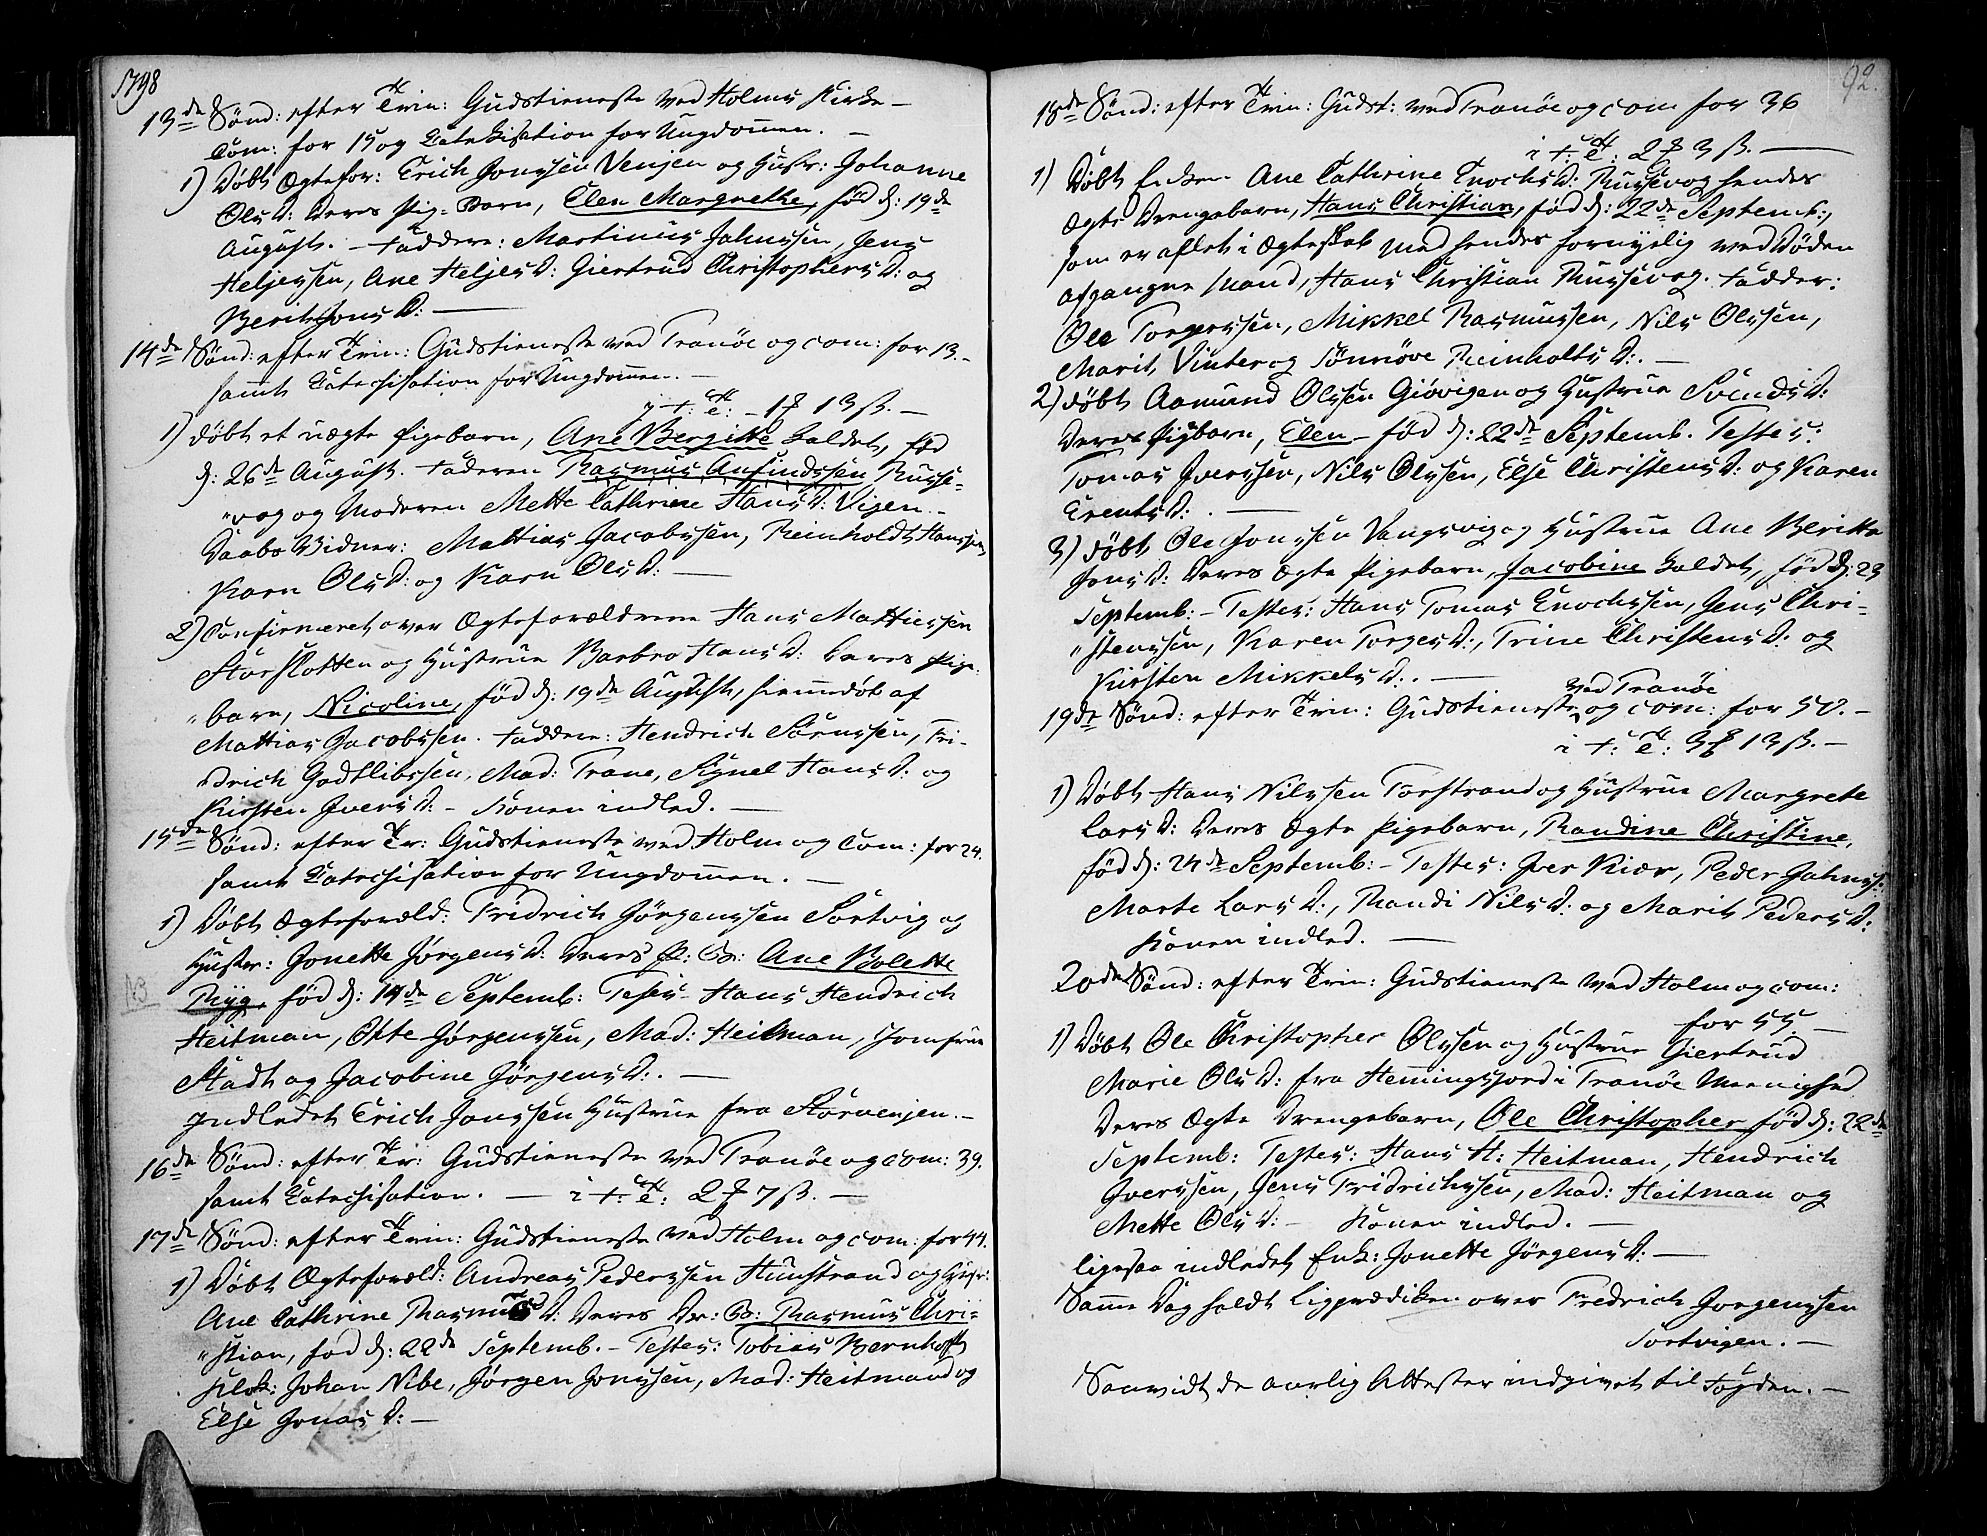 SATØ, Tranøy sokneprestkontor, I/Ia/Iaa/L0002kirke: Ministerialbok nr. 2, 1773-1806, s. 92